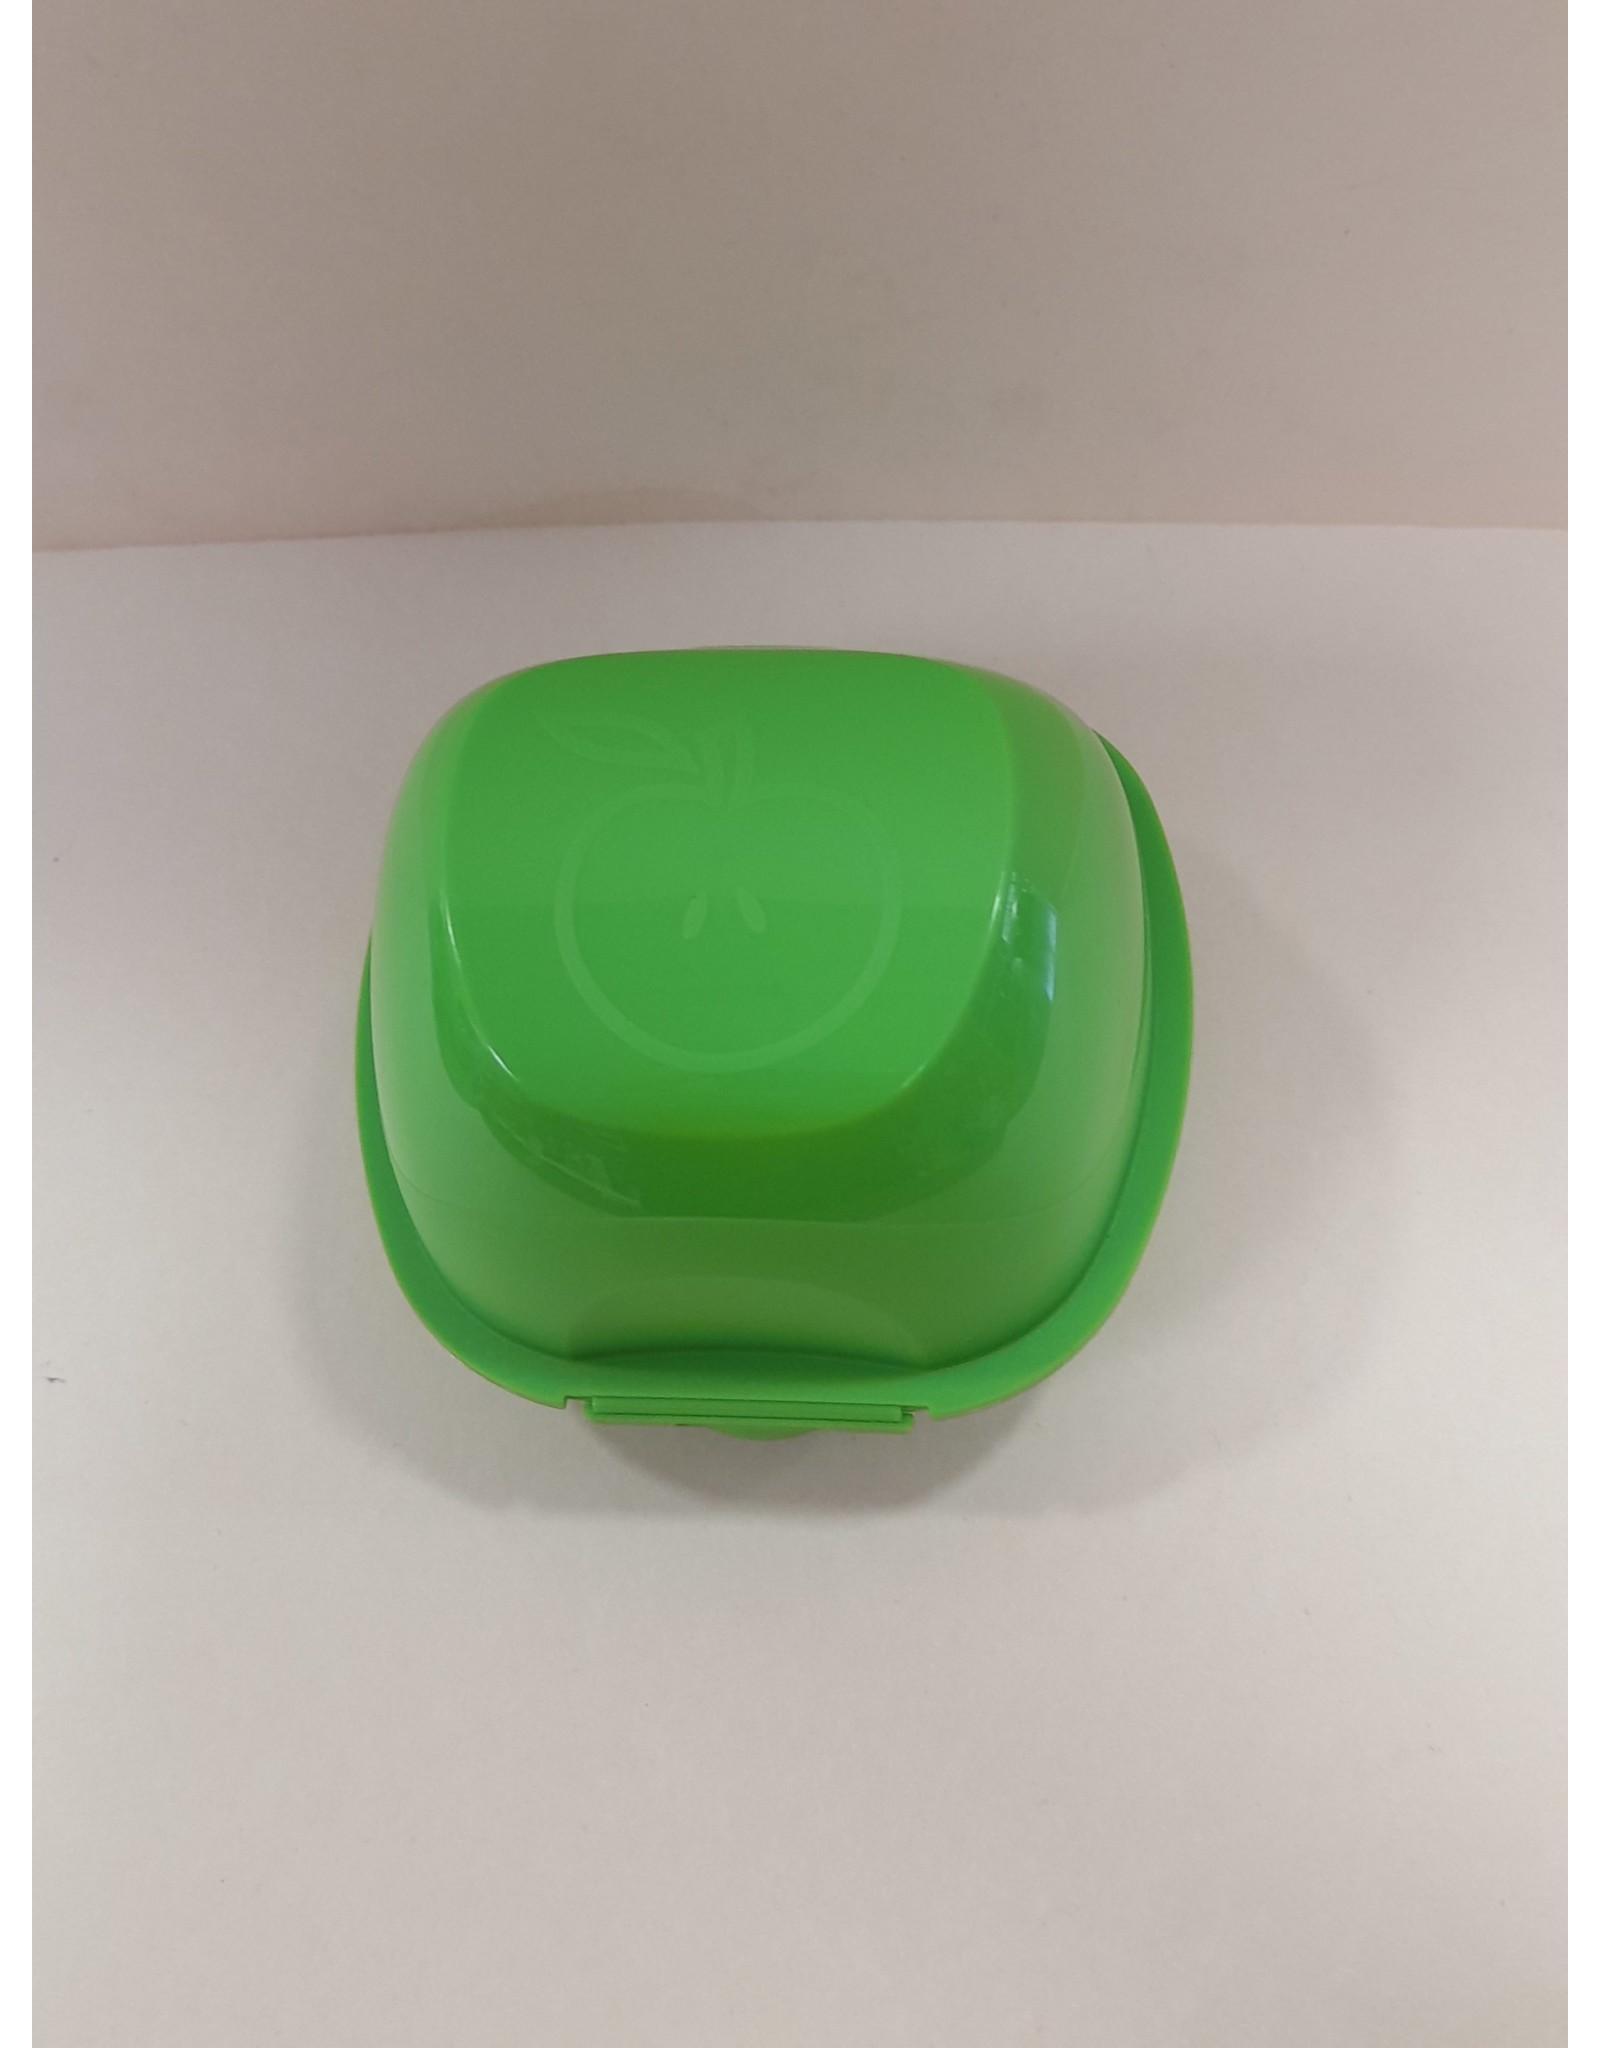 DBP Amuse Fruitbox Fresh & Fruity Appel 8 Cm Groen